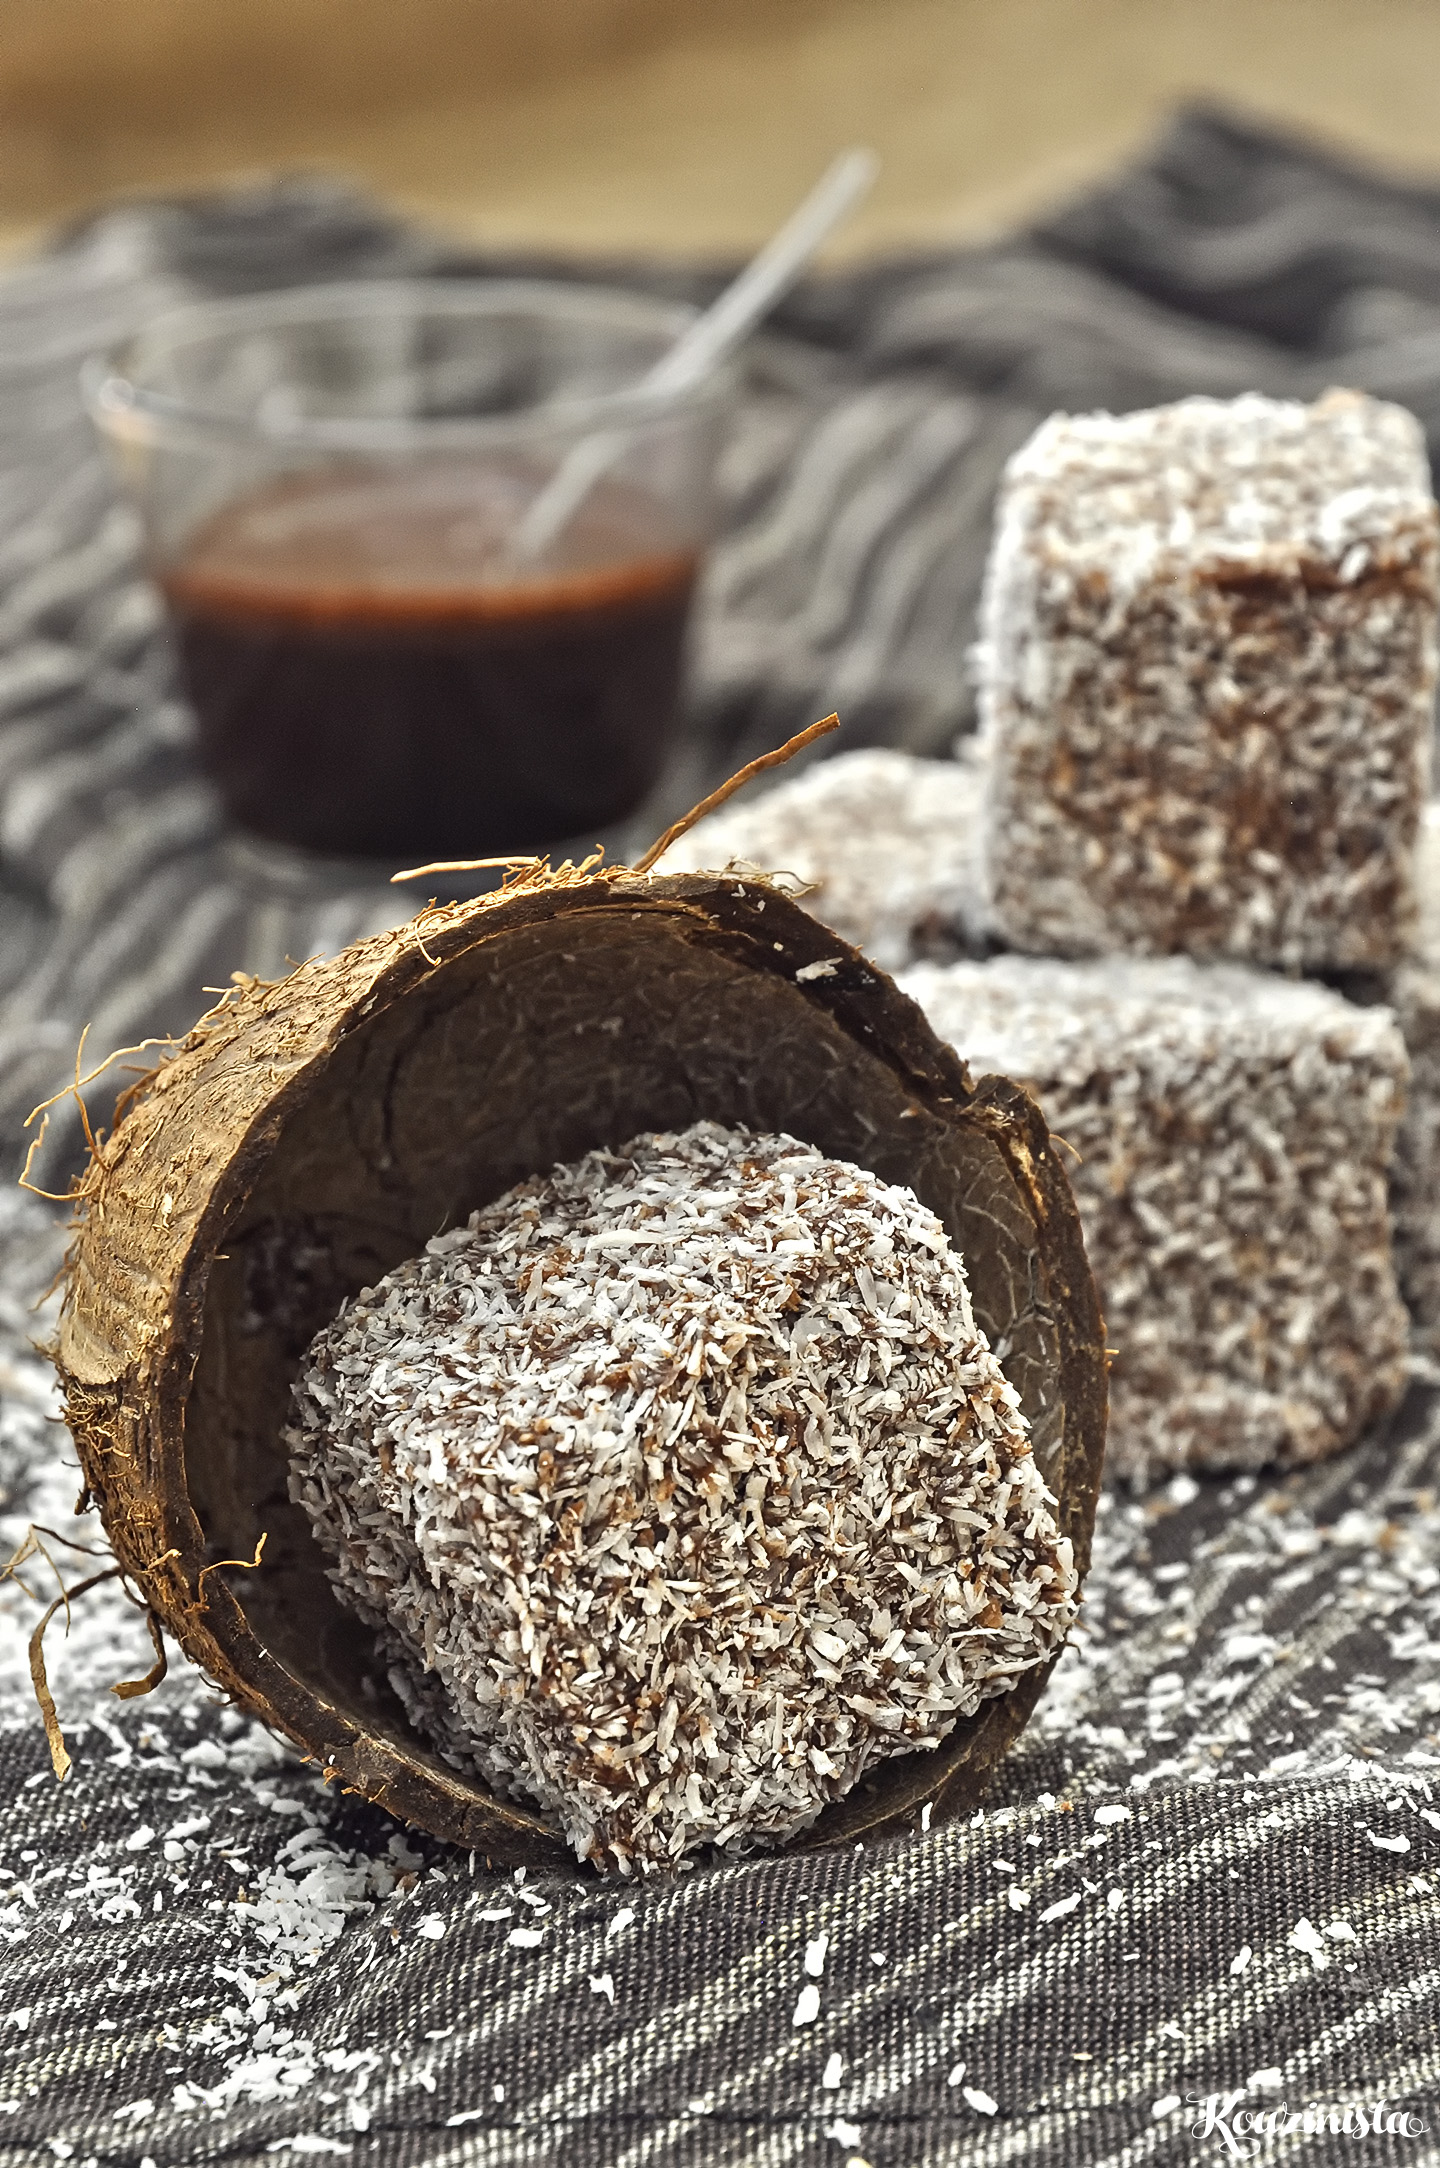 Nηστίσιμα κέικ με καρύδα και σοκολάτα (lamingtons ή χιονούλες) / Vegan lamingtons